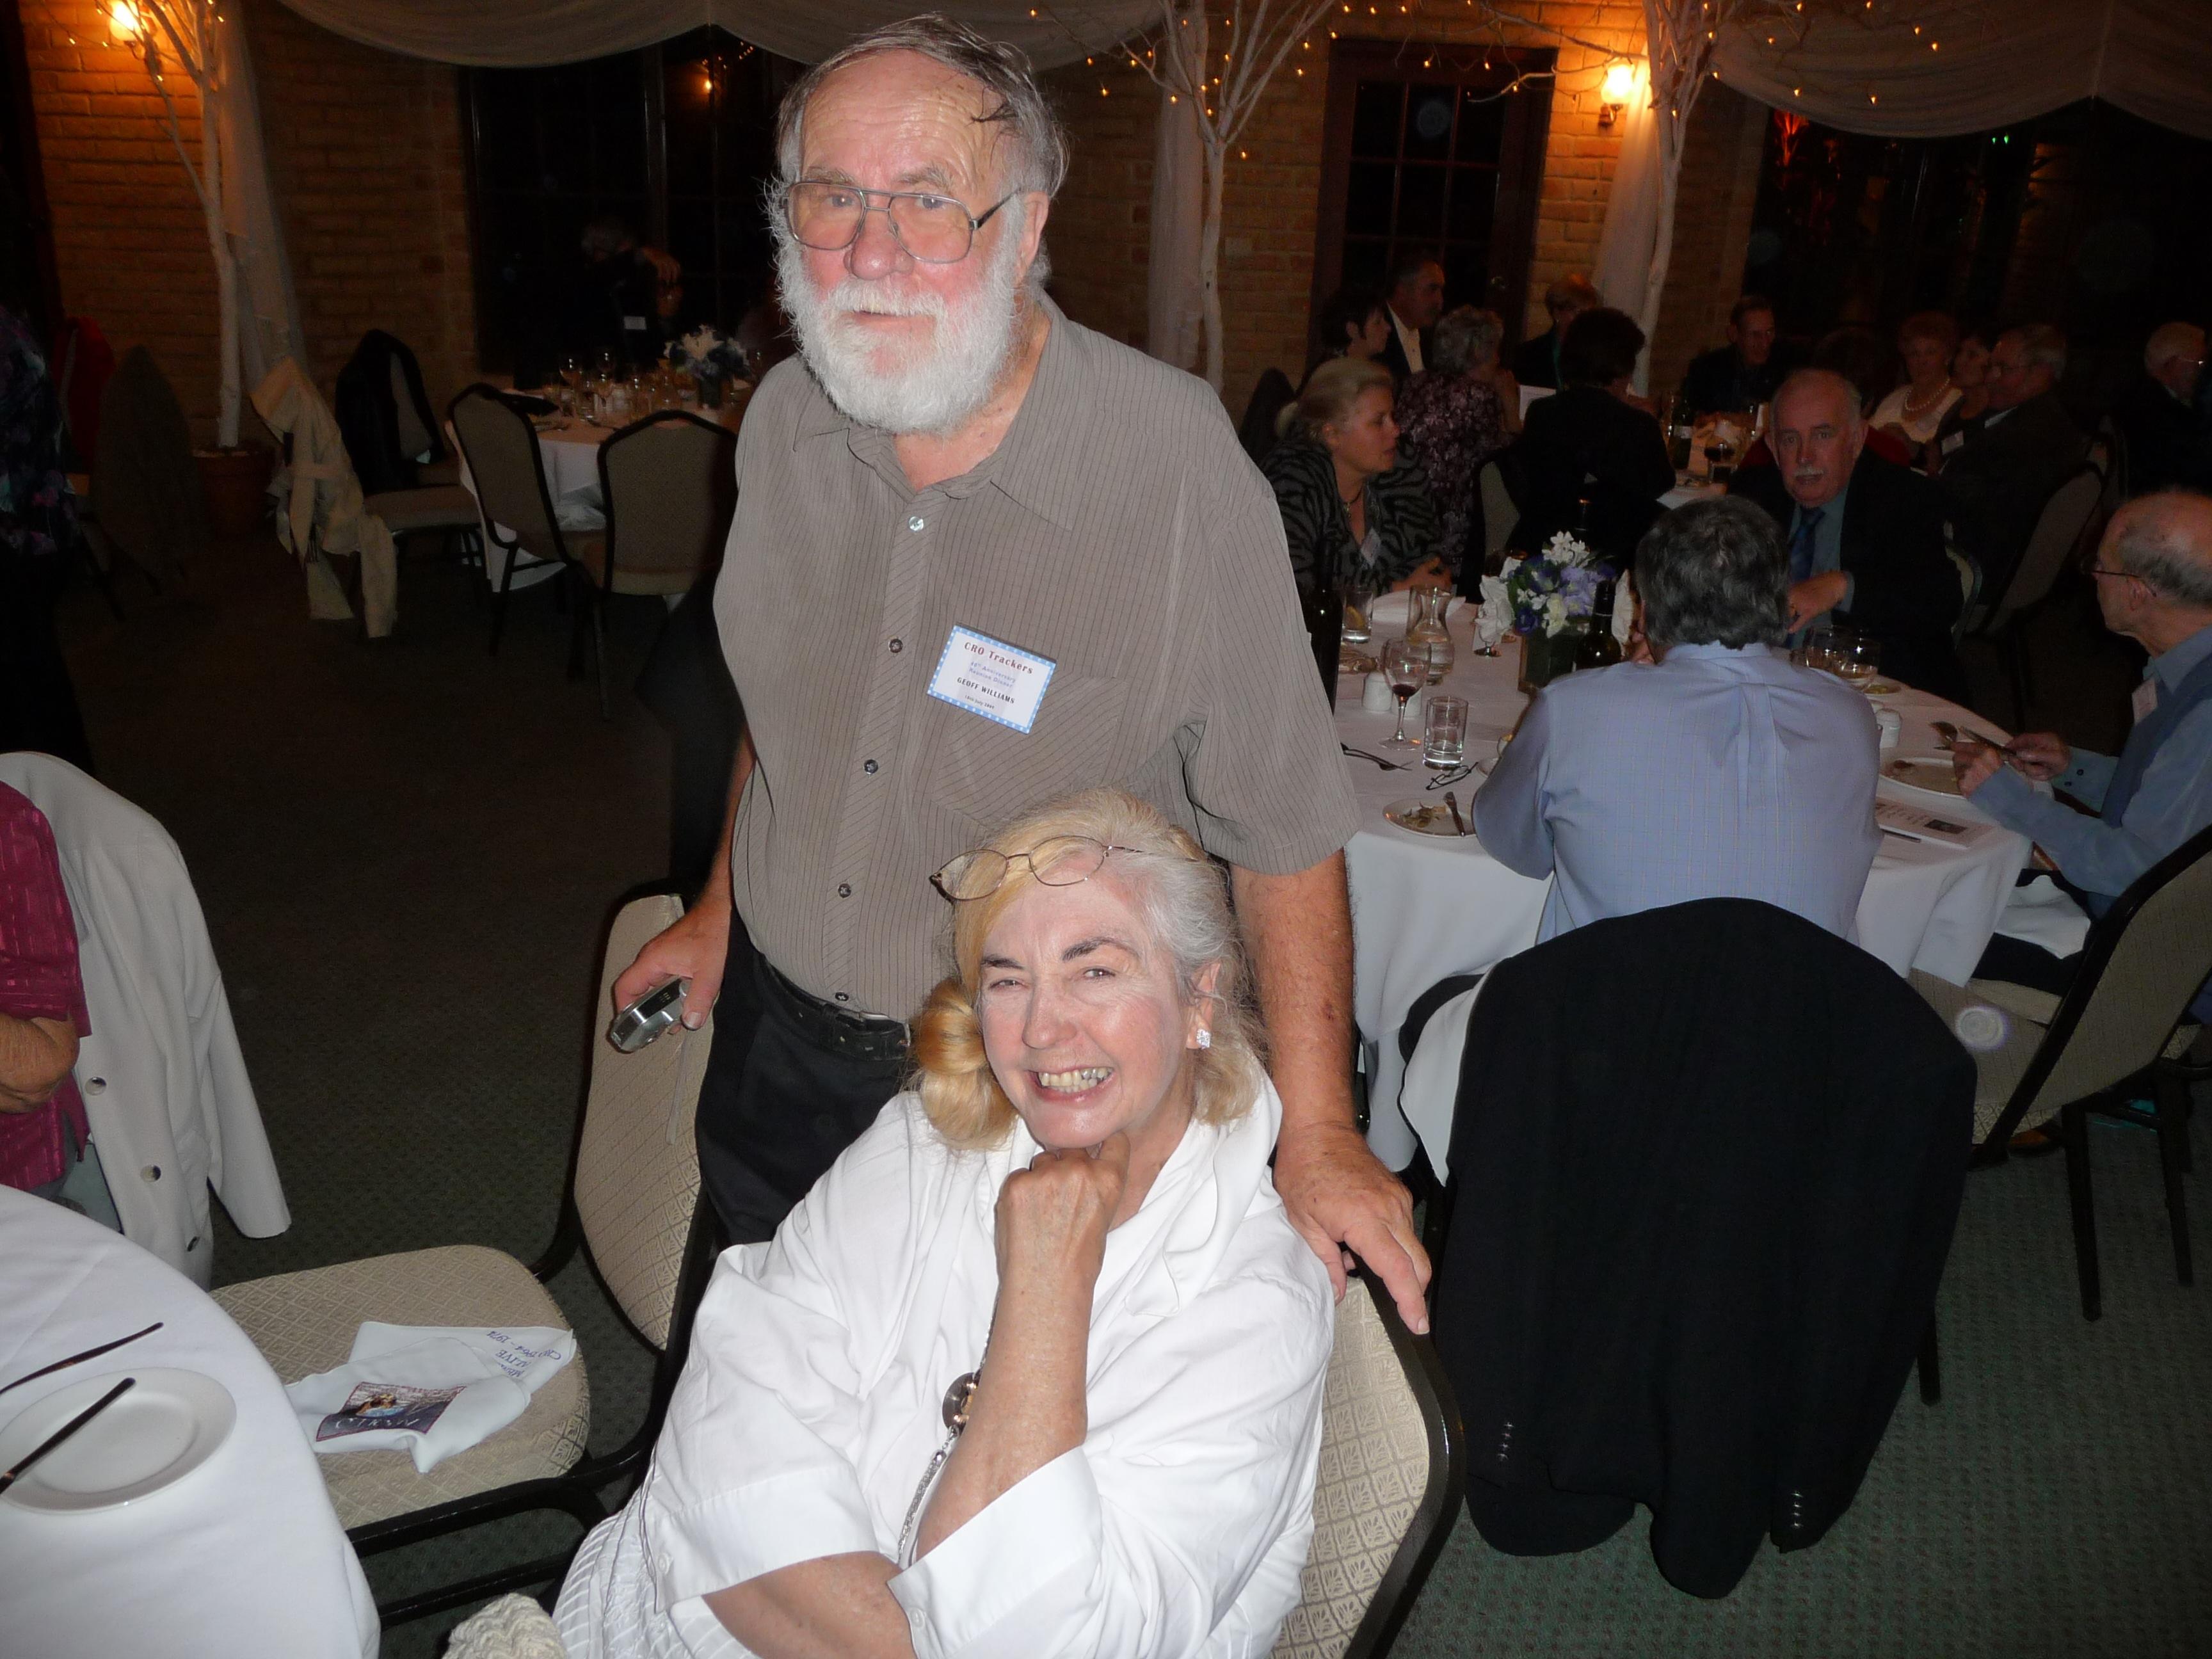 Geoff & Rosemary (Moran) Williams